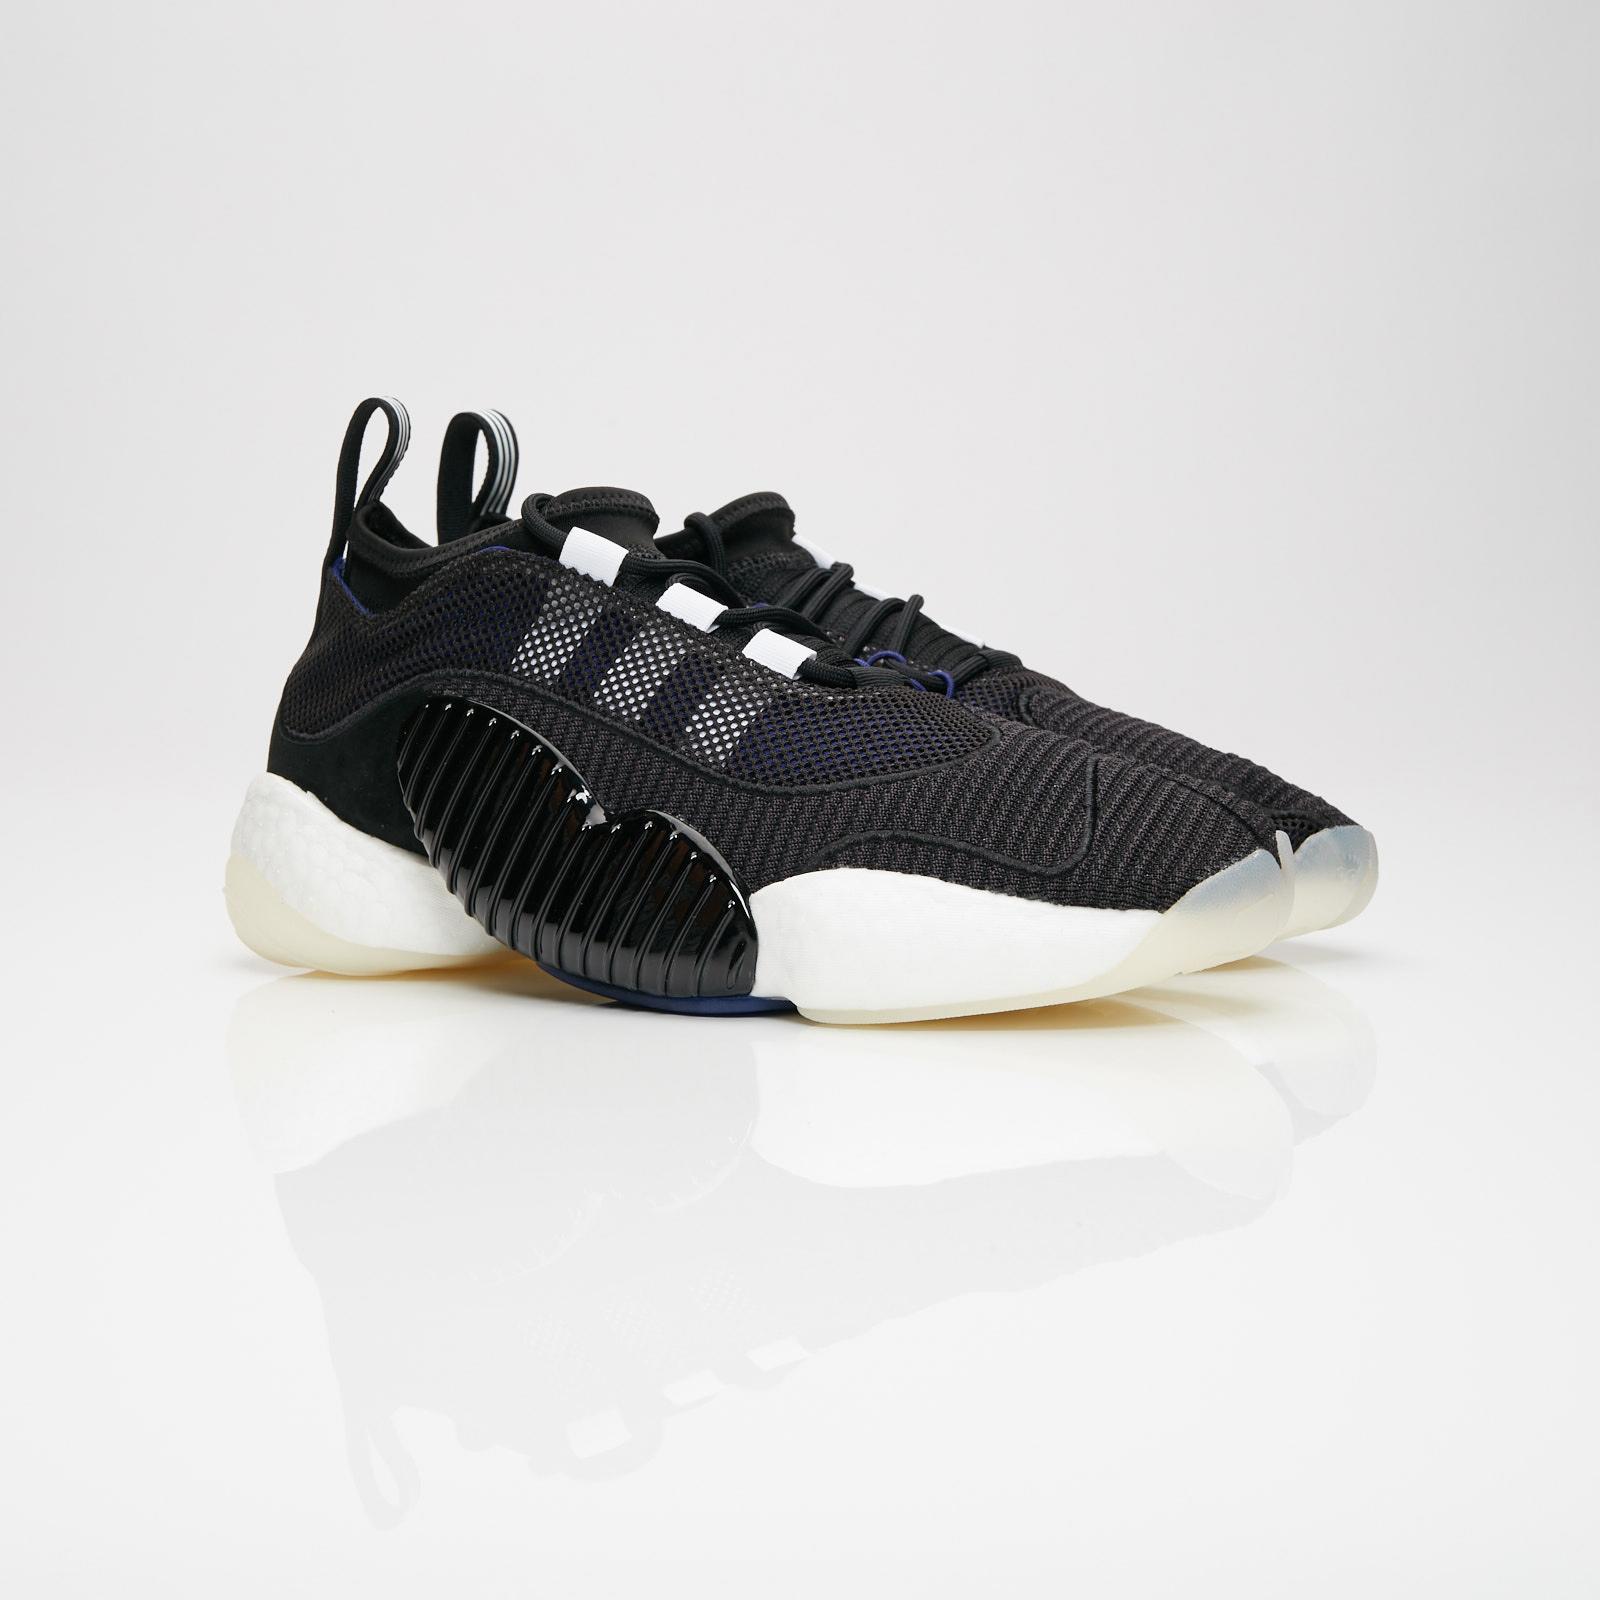 f21b6932718 adidas Crazy BYW LVL II - B37552 - Sneakersnstuff